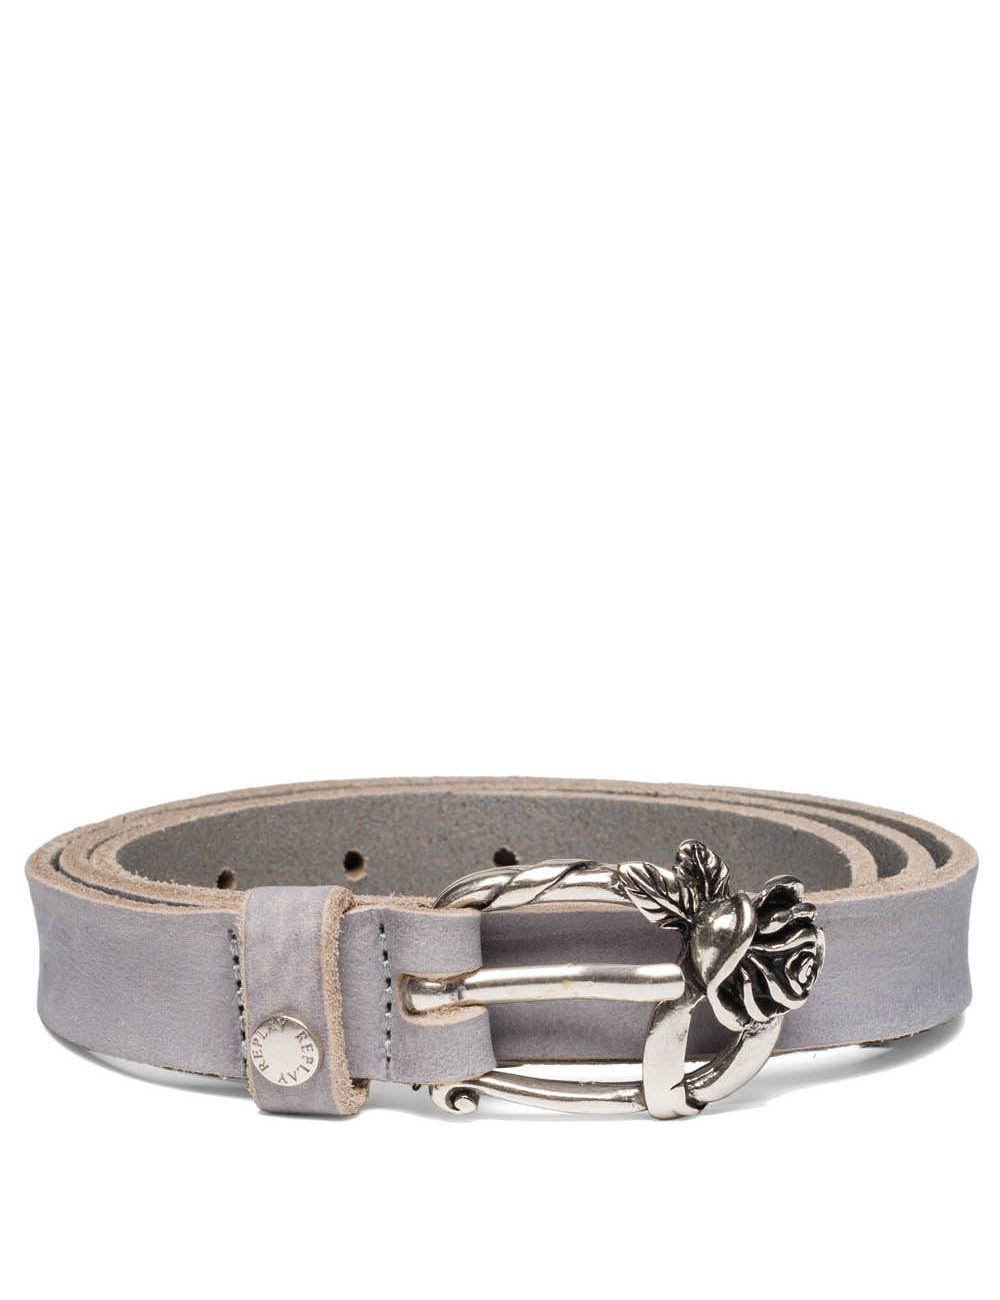 Replay Women's Women's Leather Grey Belt With Flower Buckle in Size 85 Grey